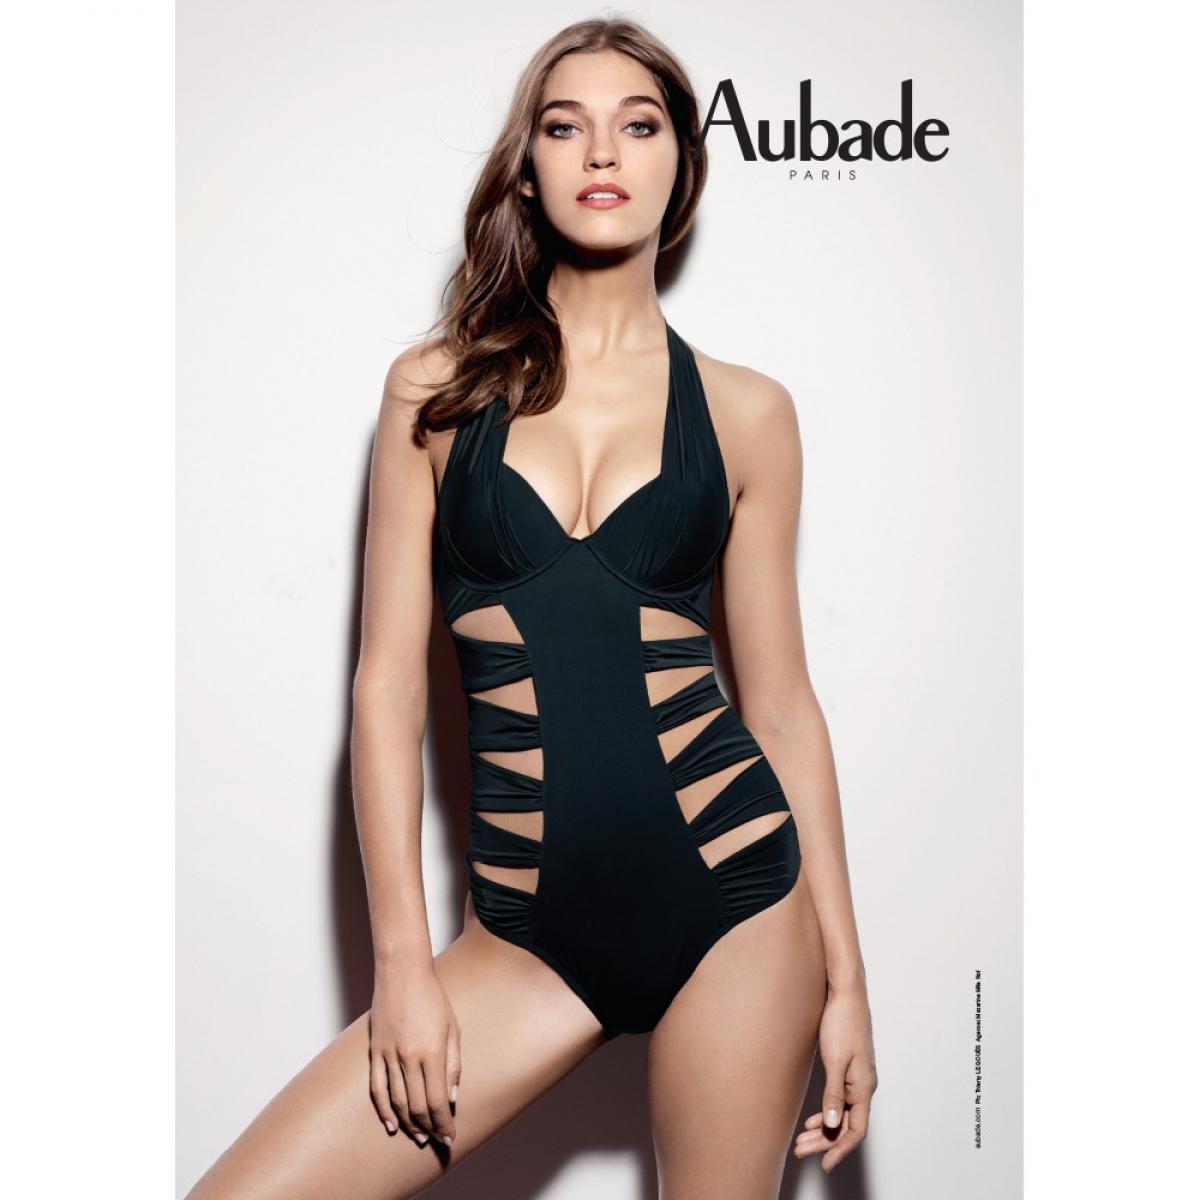 Populaire Maillot 1 pièce coque Sexy Chill Black par Aubade WS64